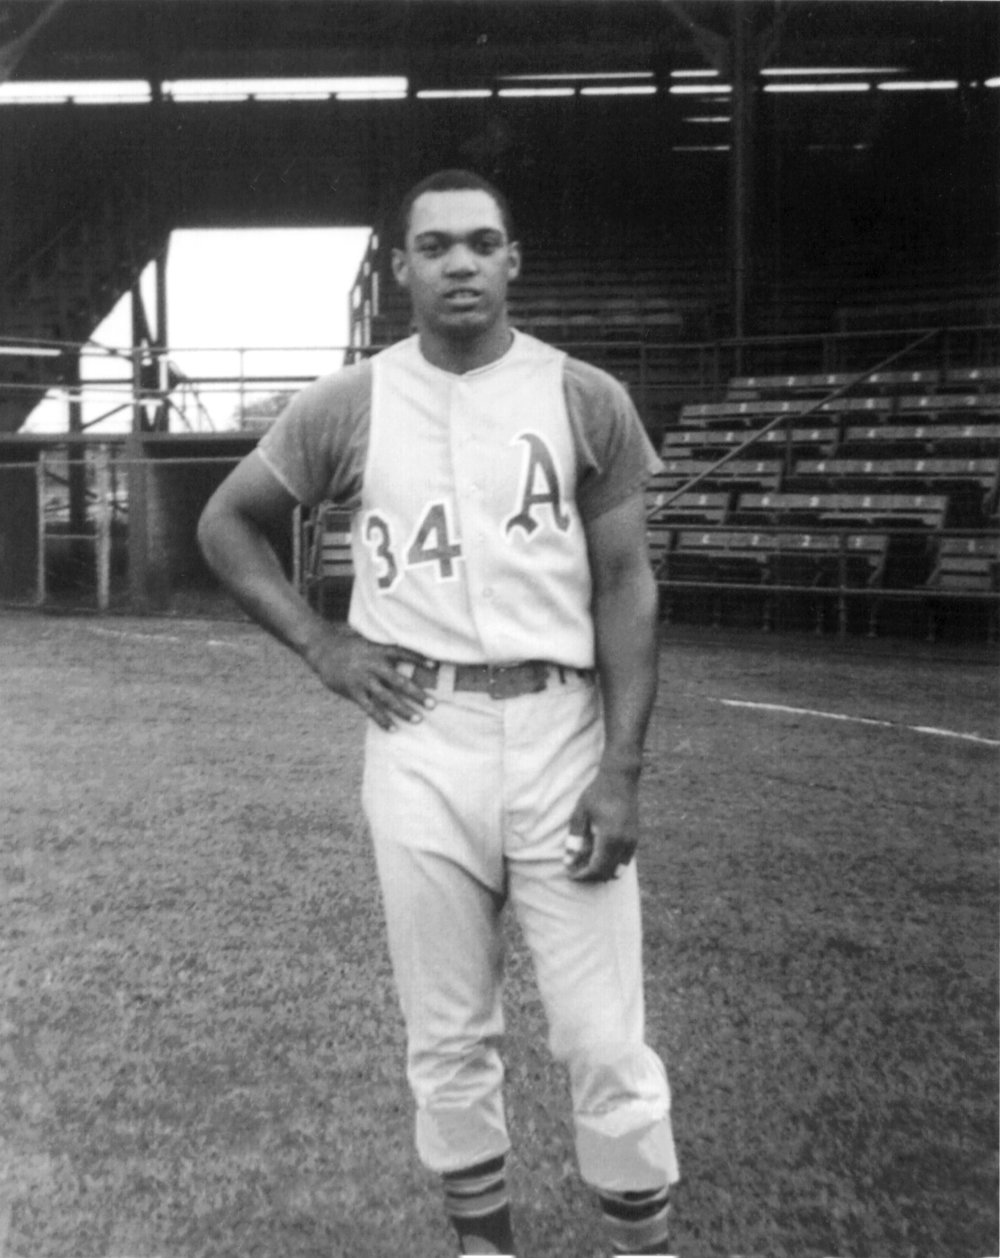 Birmingham A's Reggie Jackson at Rickwood Field, 1967 (Buddy Coker)